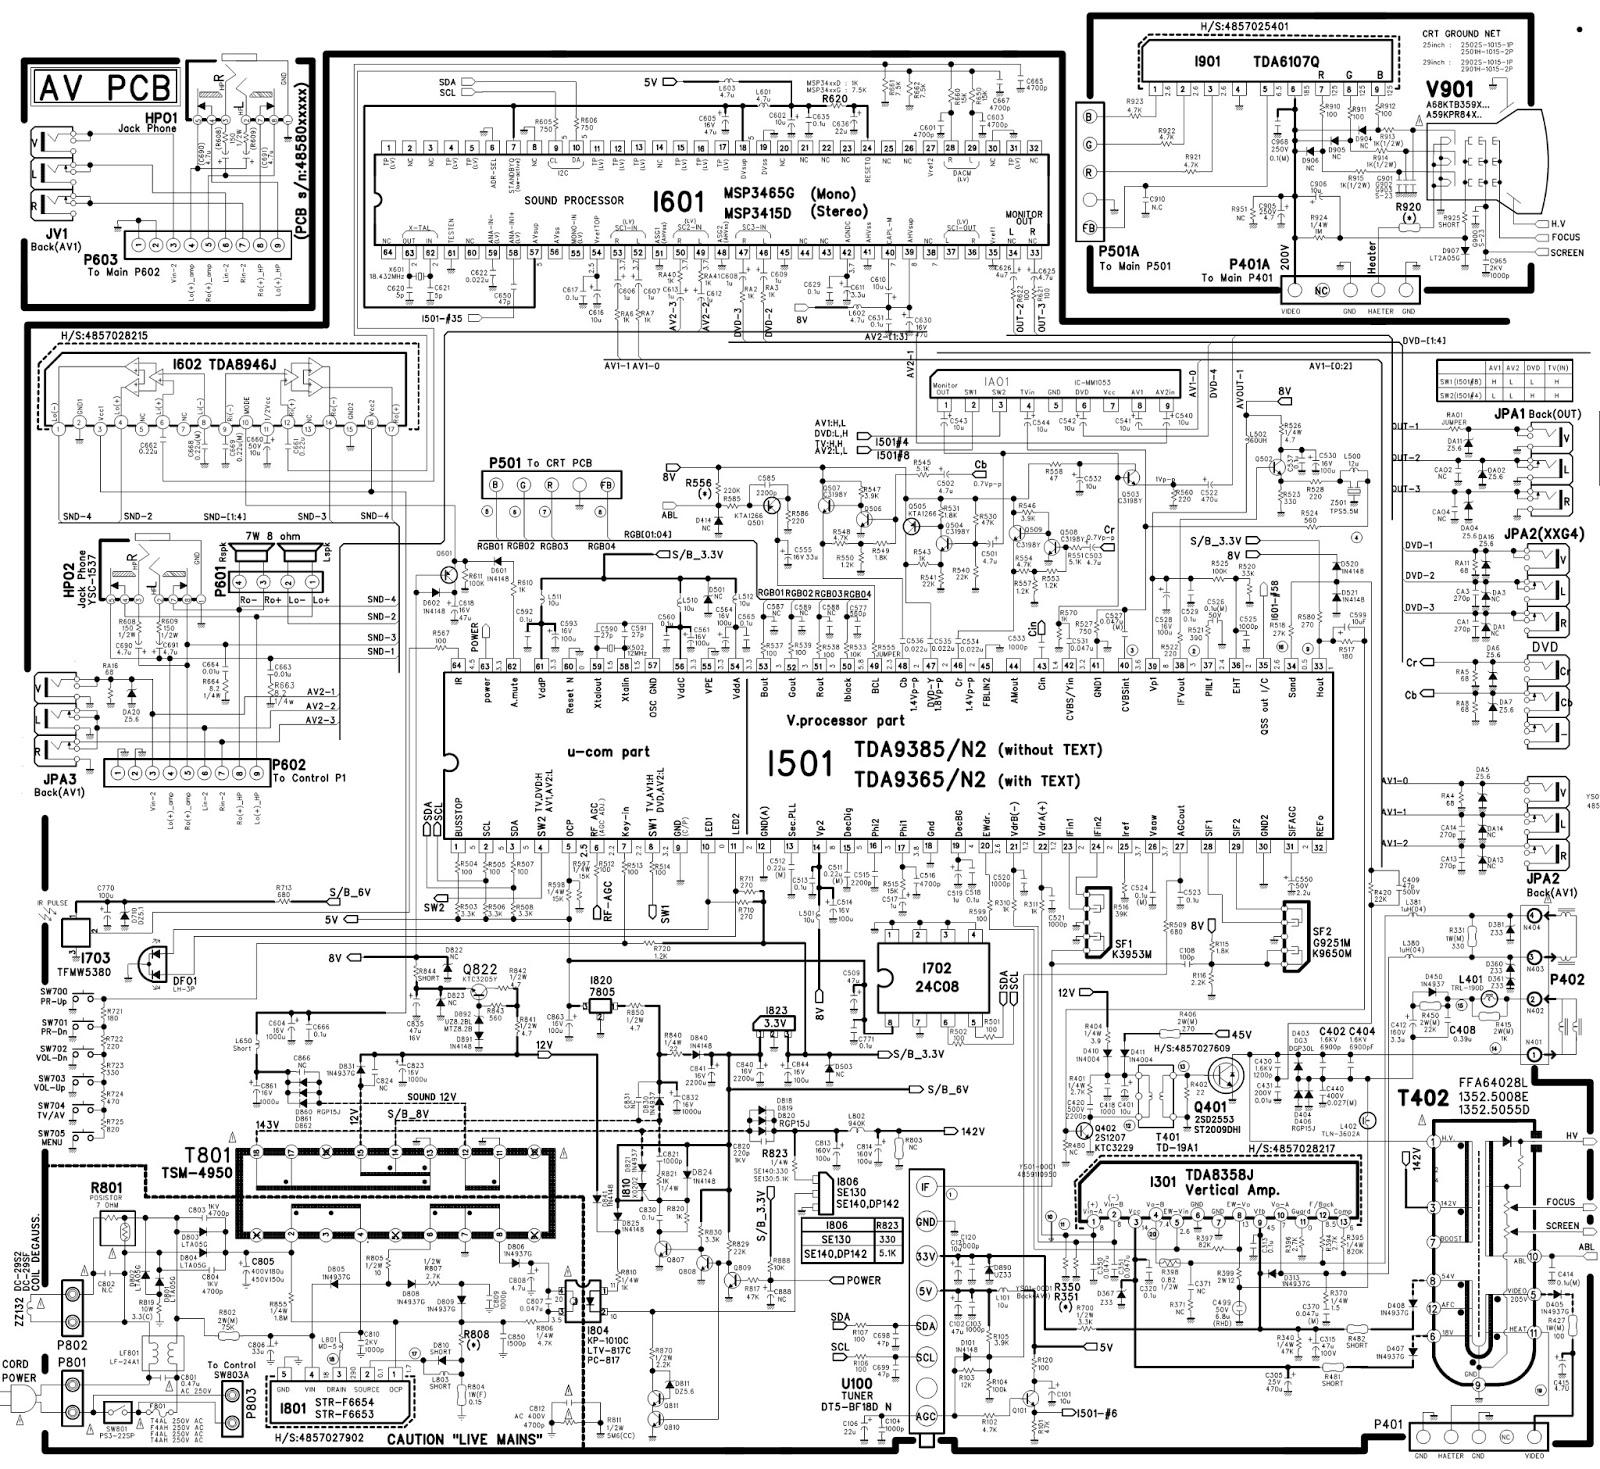 Nec Electrical Logic Diagram Electrical Drawing Symbols